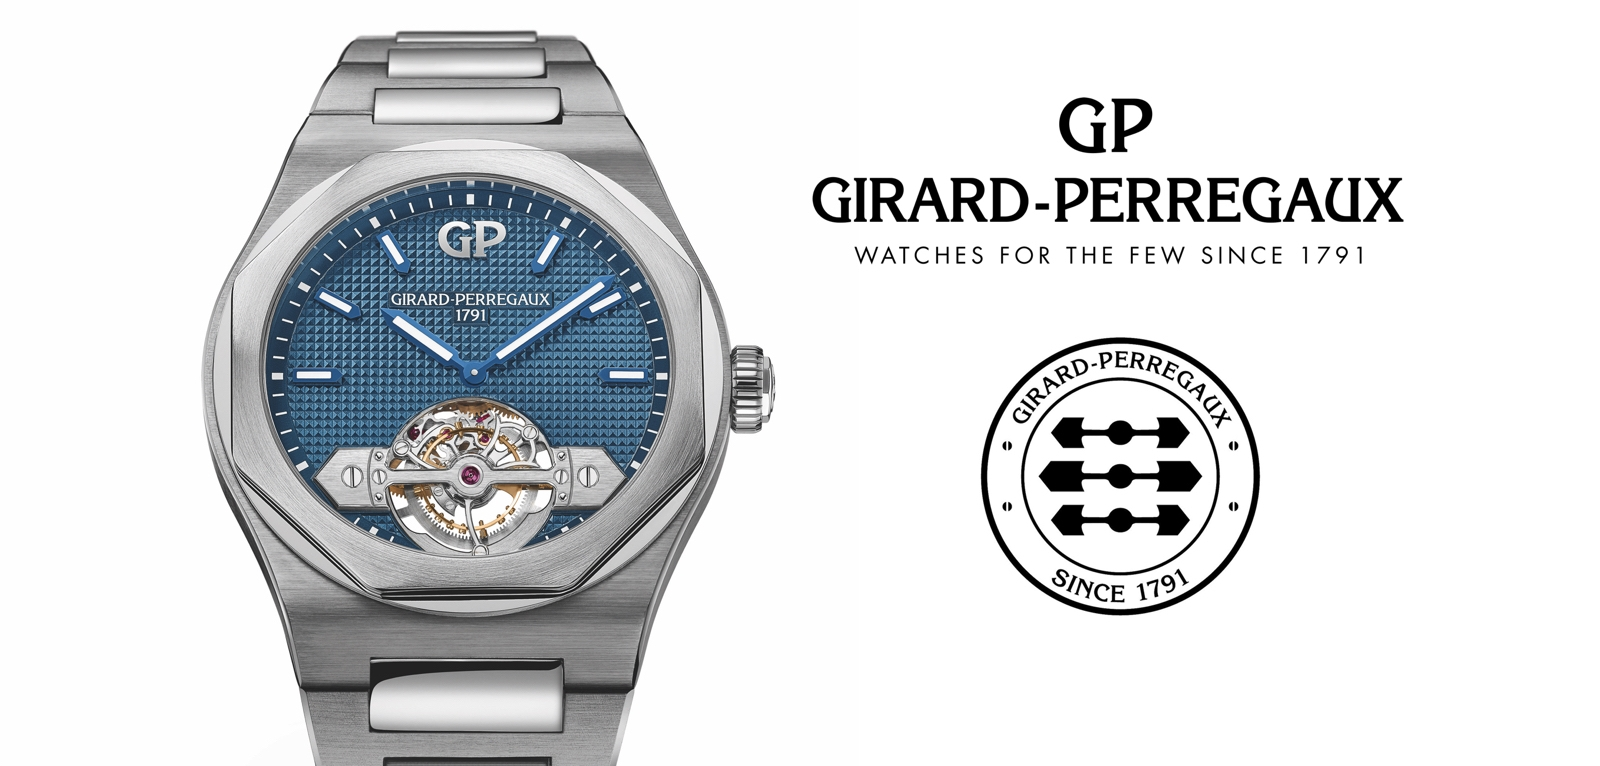 Girard-Perregaux Laureato Tourbillon, ahora en caja de titanio de 43 mm.